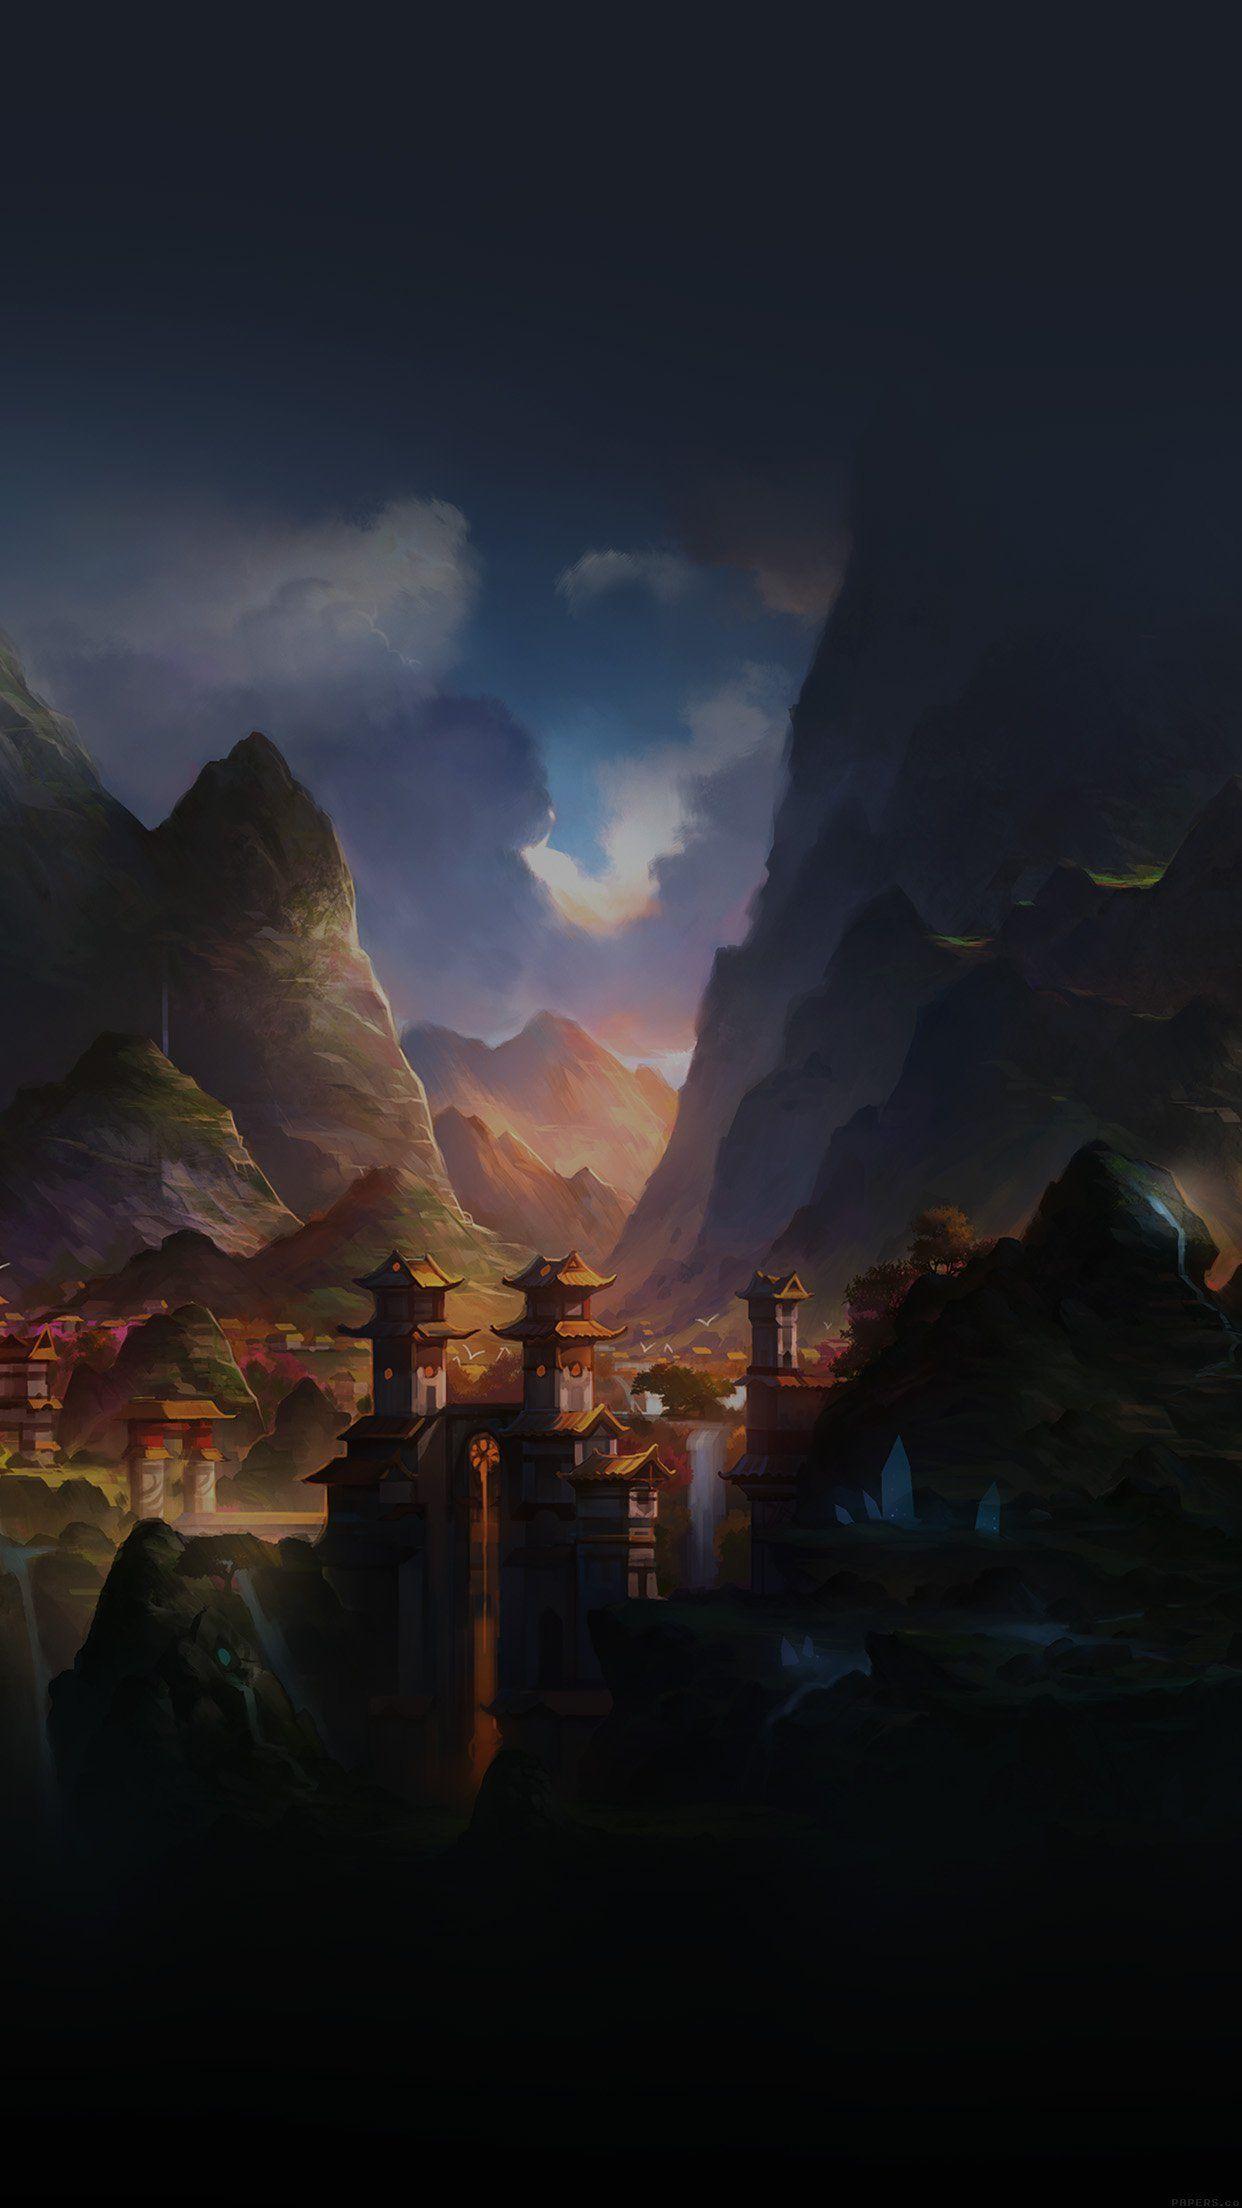 Peaceful Anime Background : peaceful, anime, background, Anime, Peaceful, Wallpapers, WallpaperDog